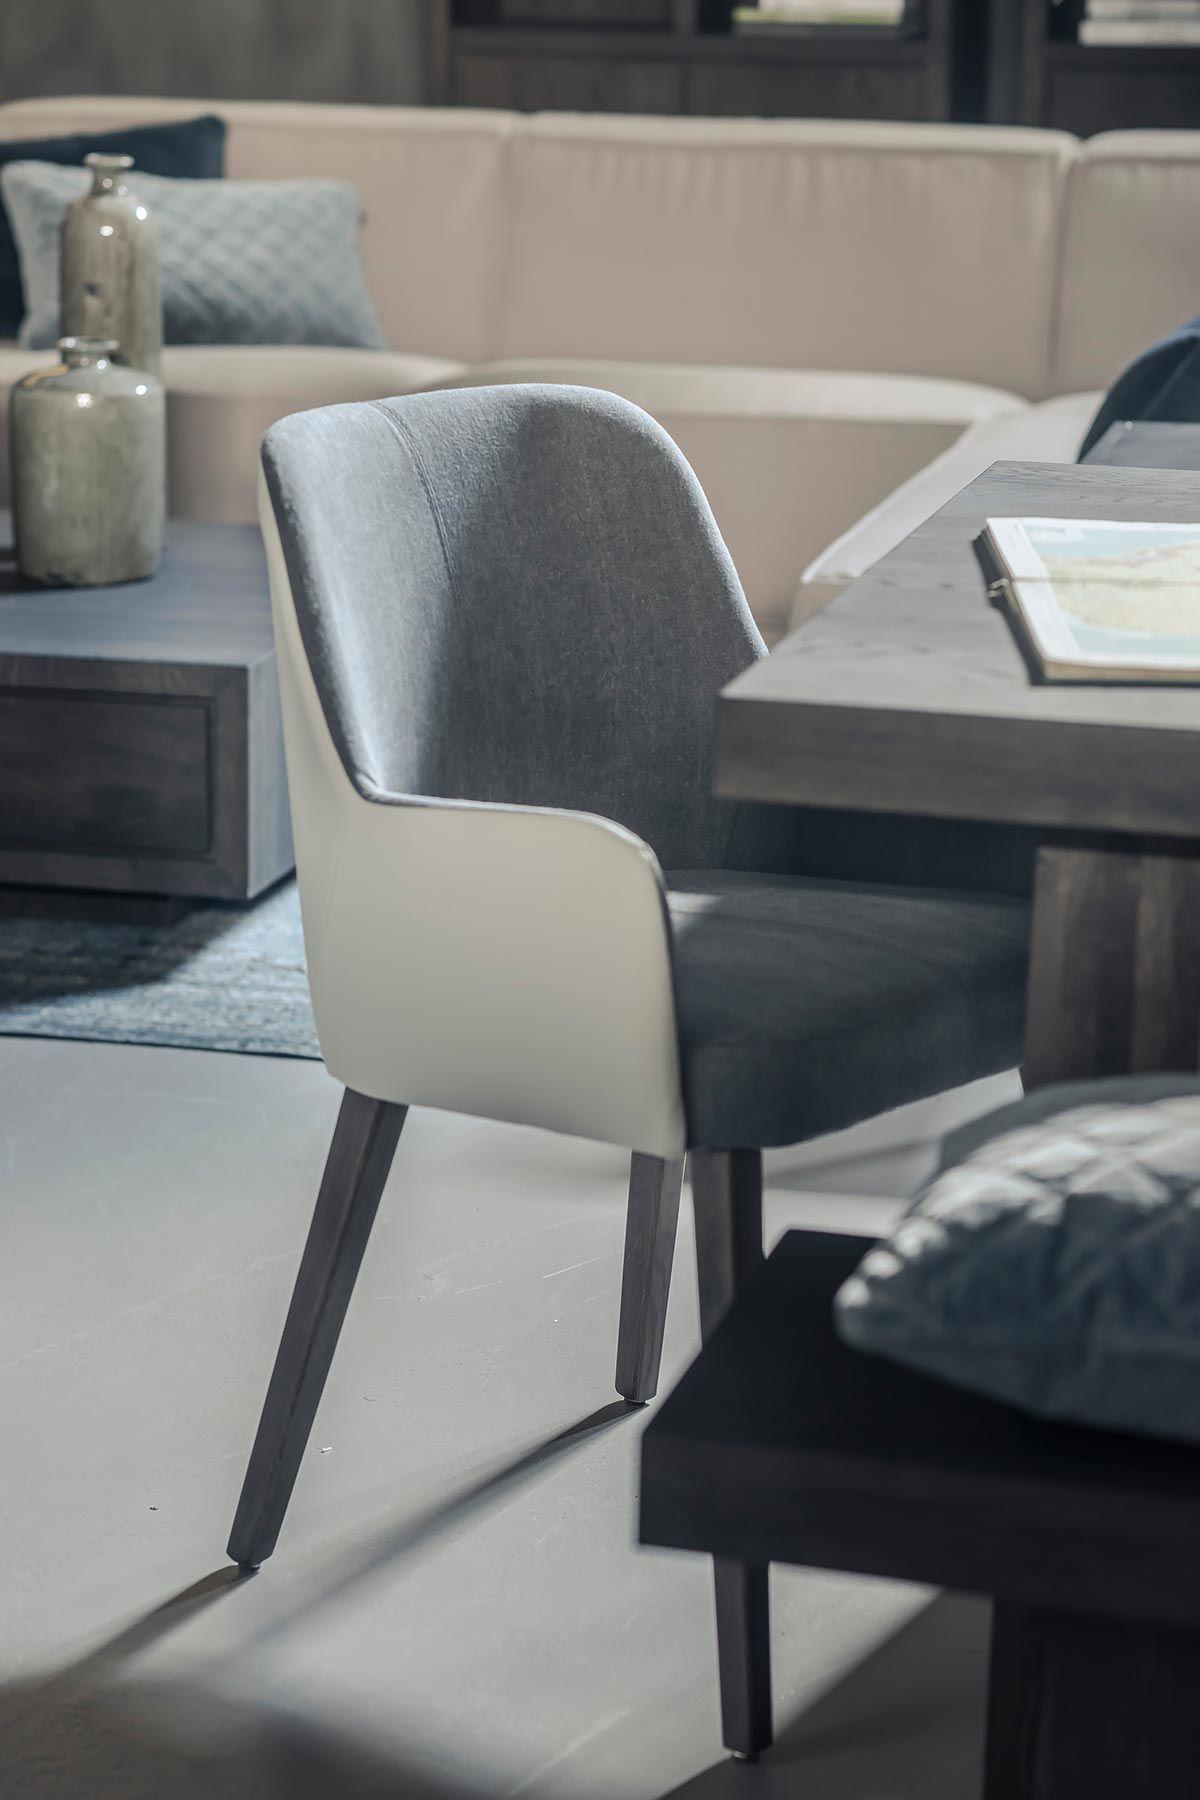 Eettafel Stoelen Blauw Leer.Eetkamerstoel Leer Stof Eetkamerstoel Stoer Furniture In 2019